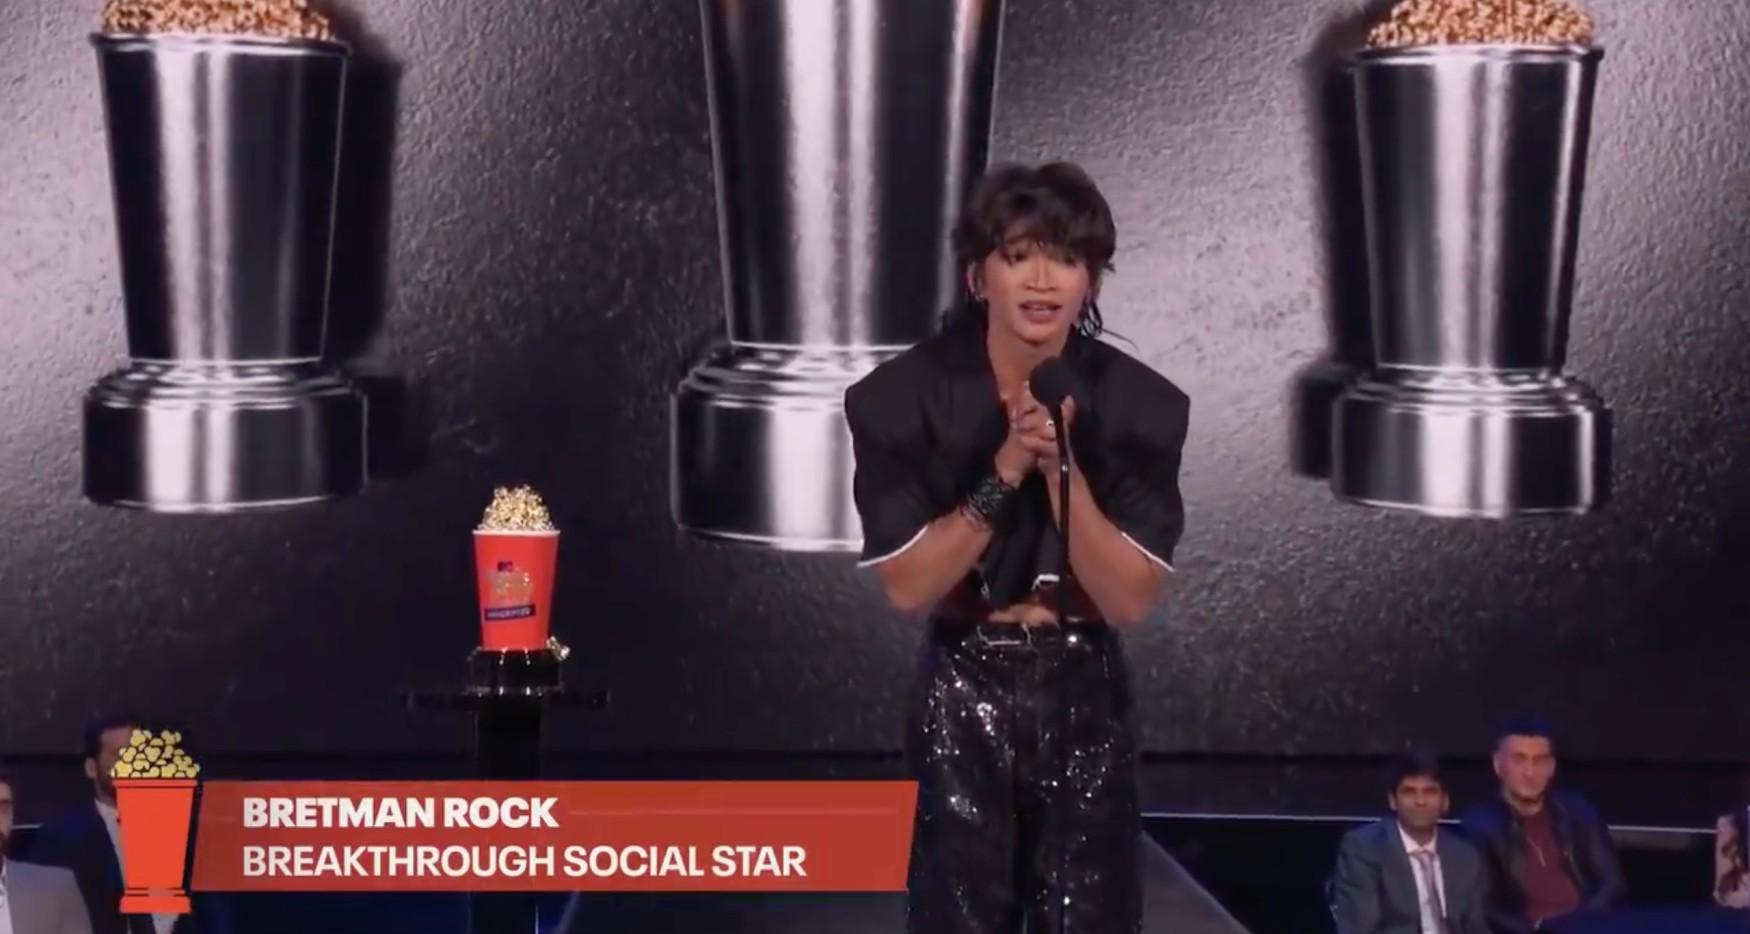 Bretman Rock MTV award